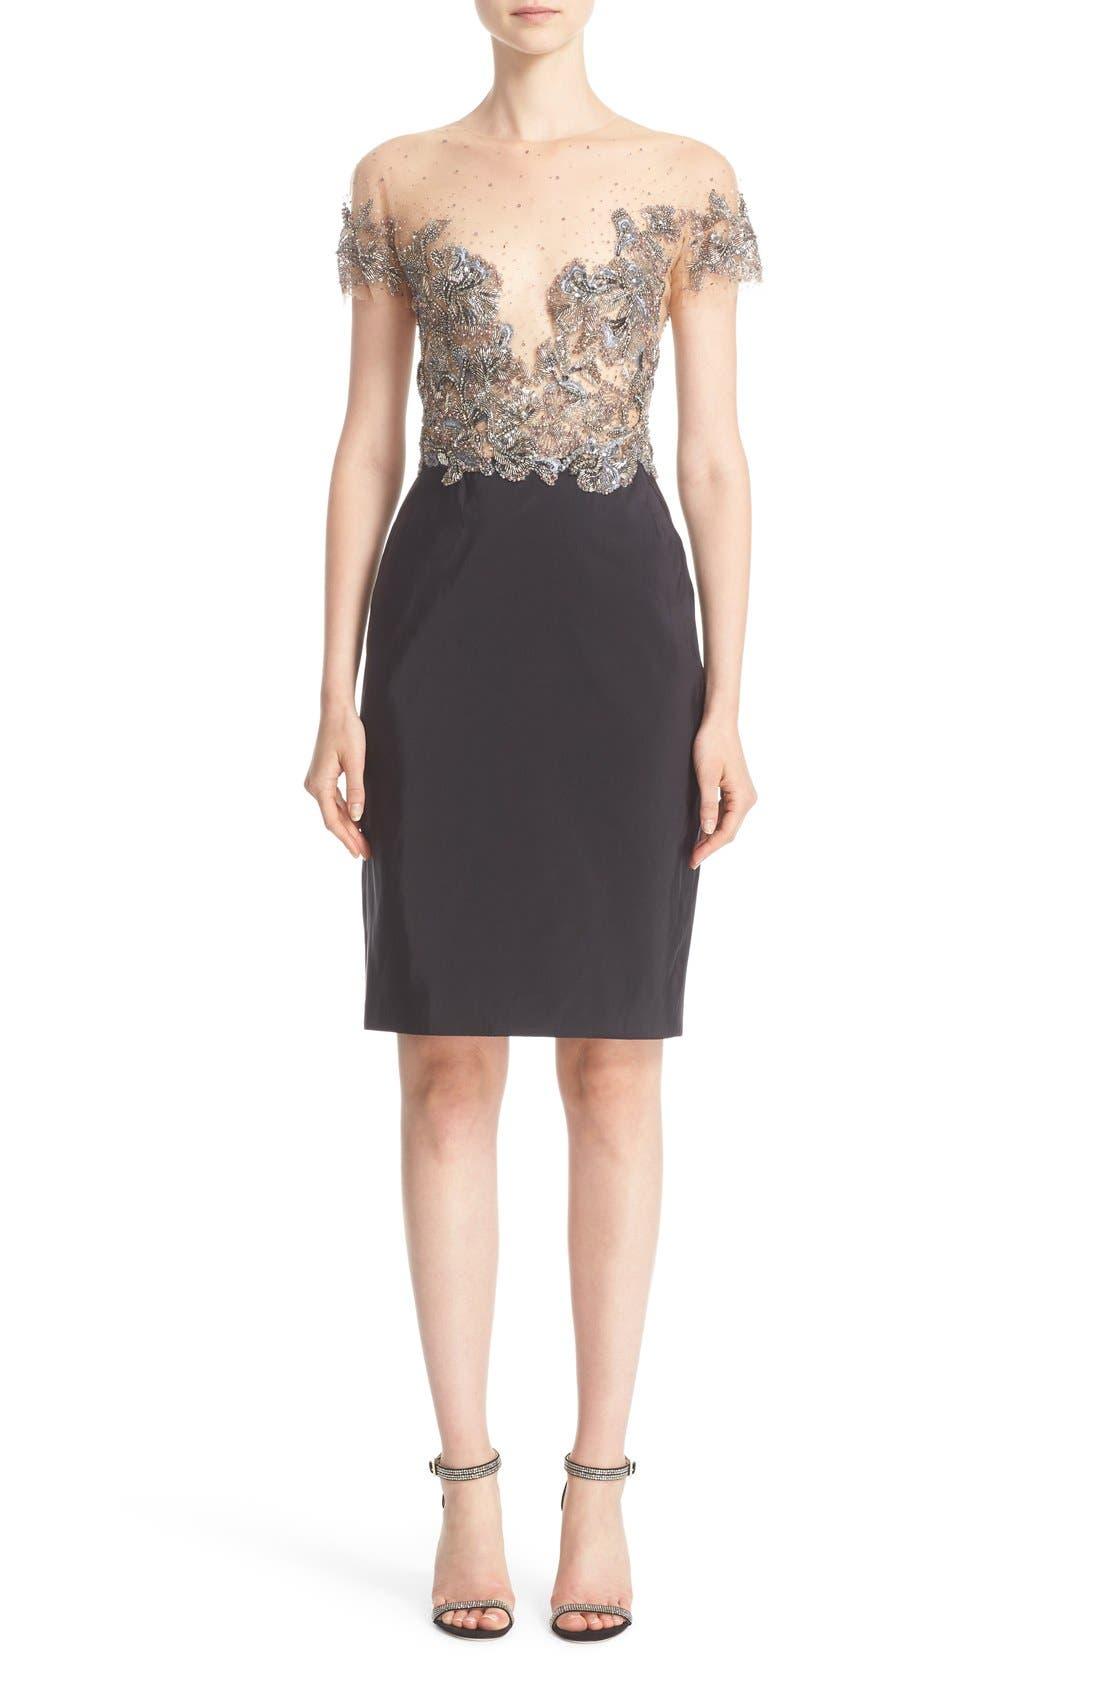 Alternate Image 1 Selected - Marchesa Embellished Tulle Bodice Sheath Dress (Nordstrom Exclusive)